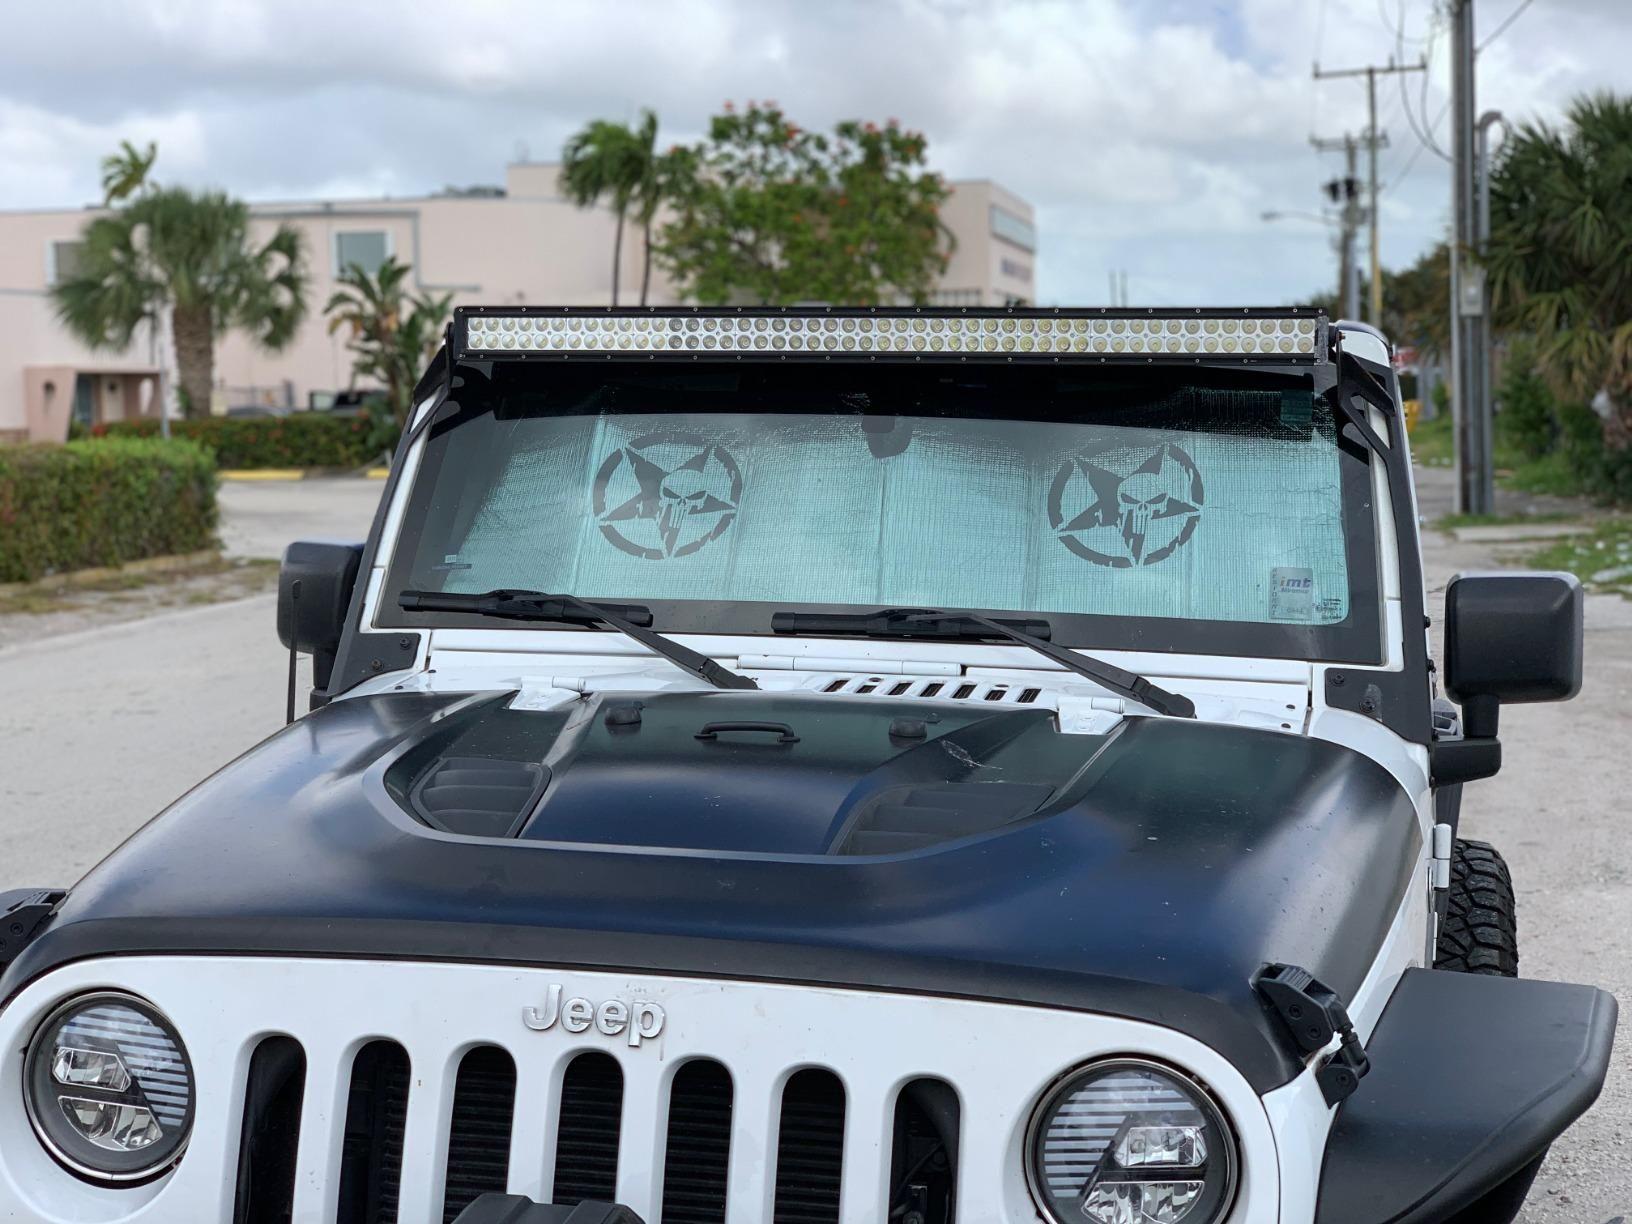 Jeep Wrangler Sun Shade In 2020 Jeep Wrangler Rubicon Jeep Wrangler Jeep